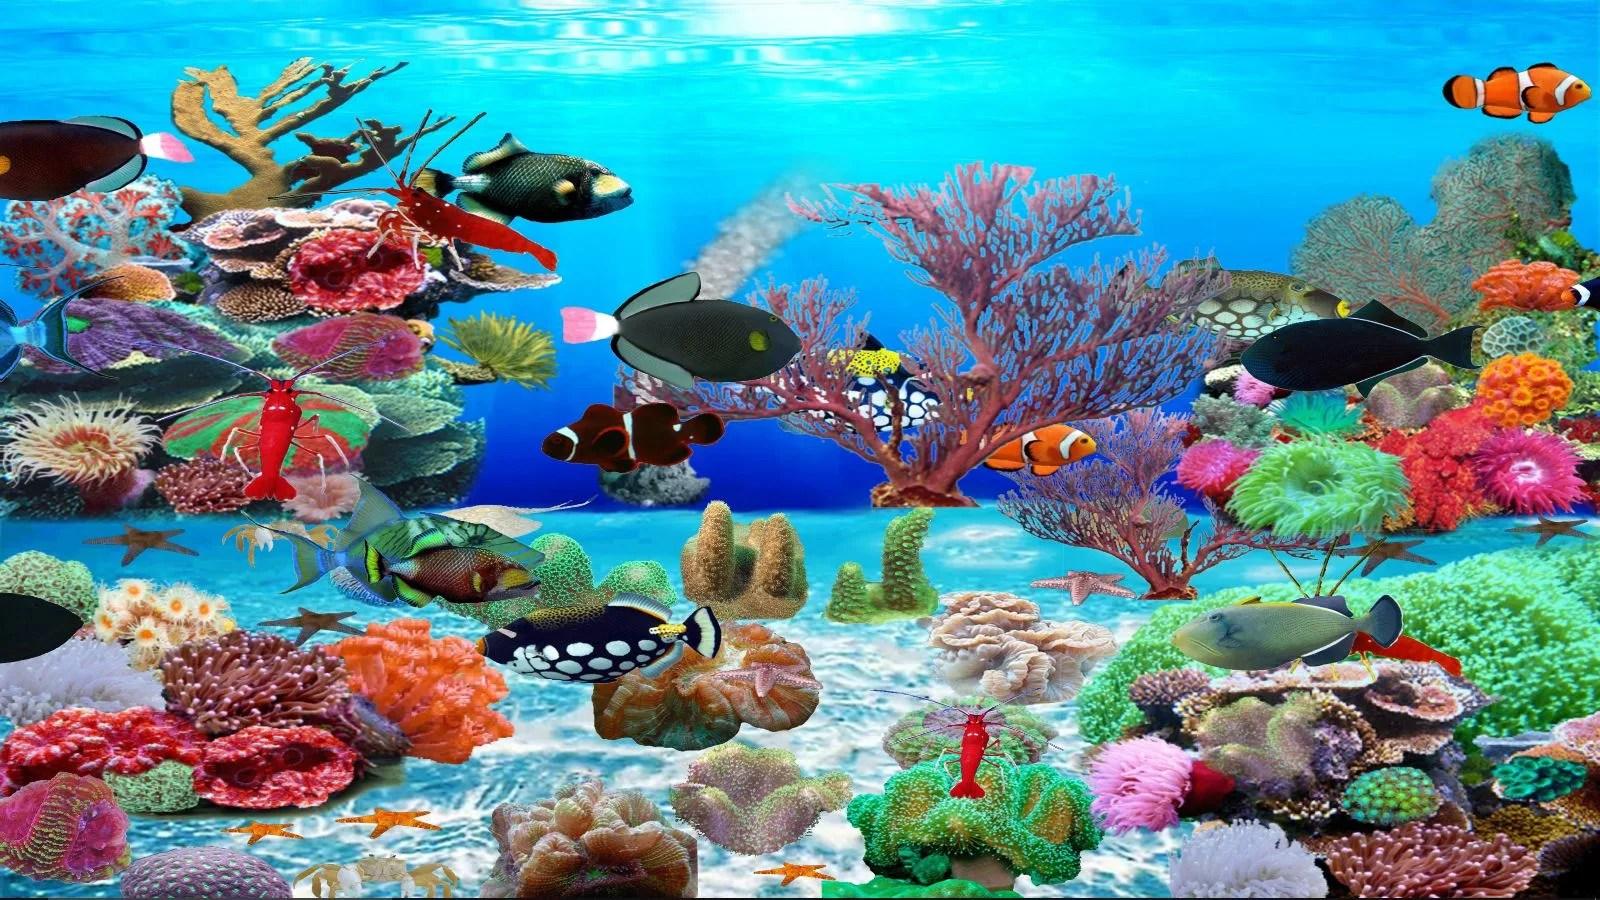 Animated Fish Tank Wallpaper Trigger Fish Aquarium Download